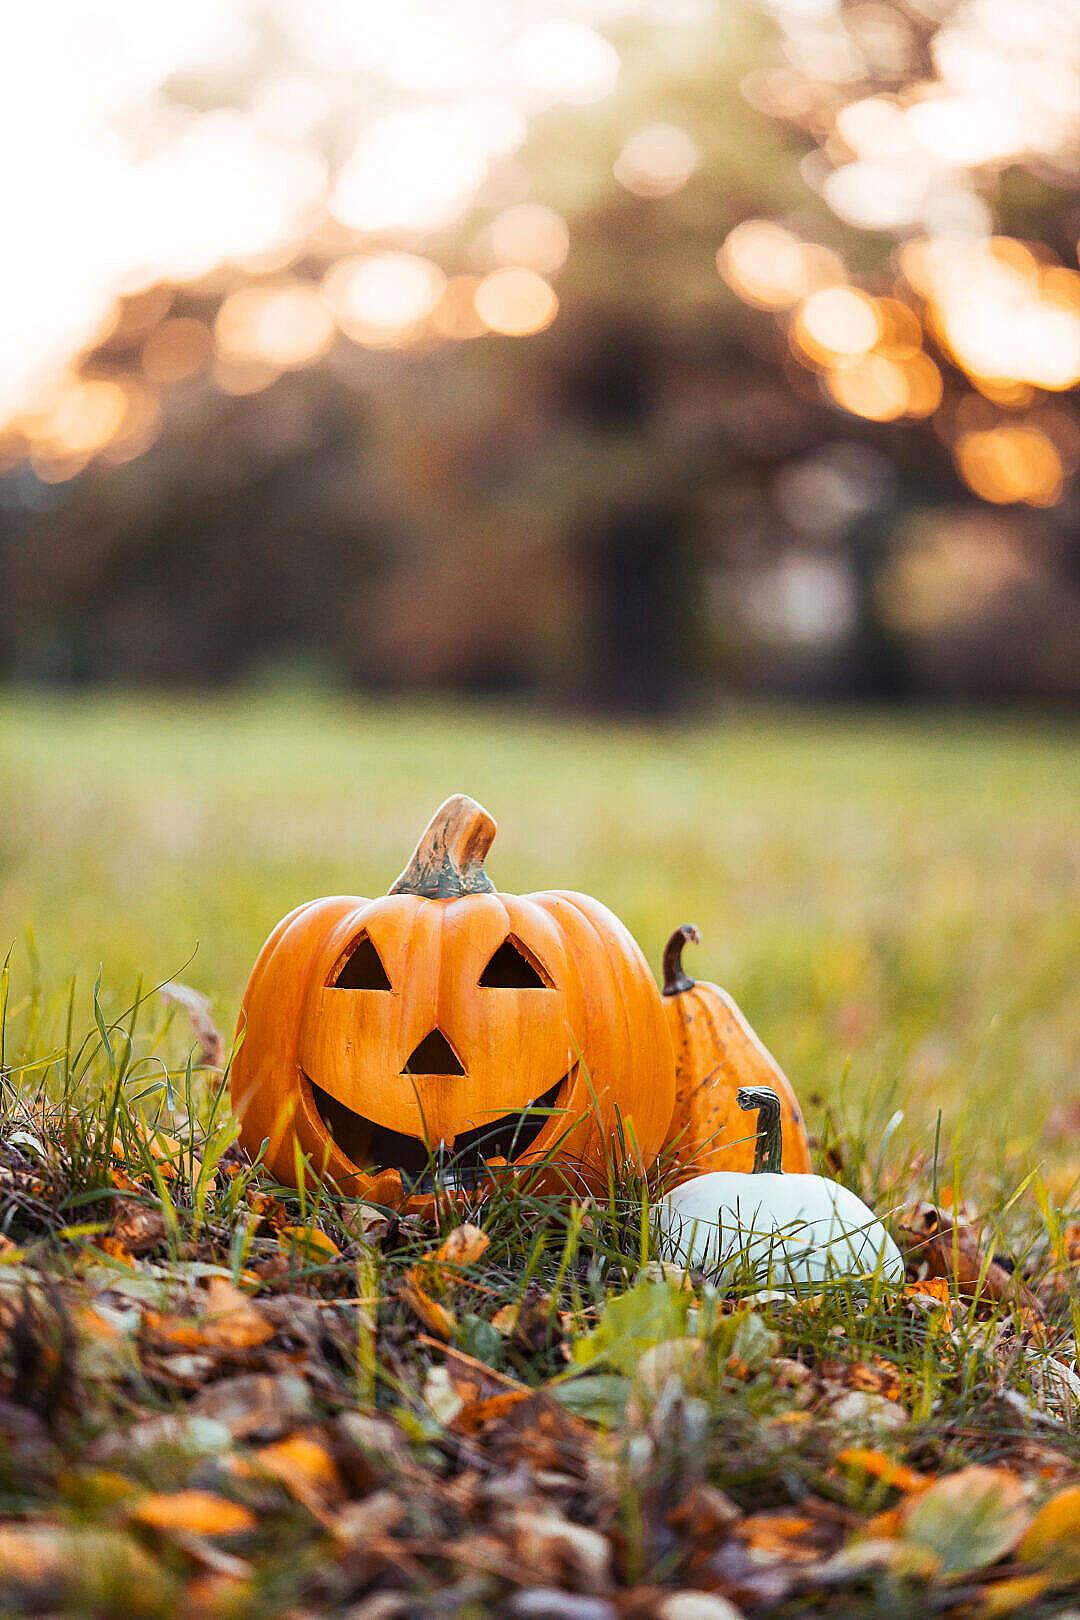 Download Halloween Pumpkins Decorations in Autumn Grass FREE Stock Photo